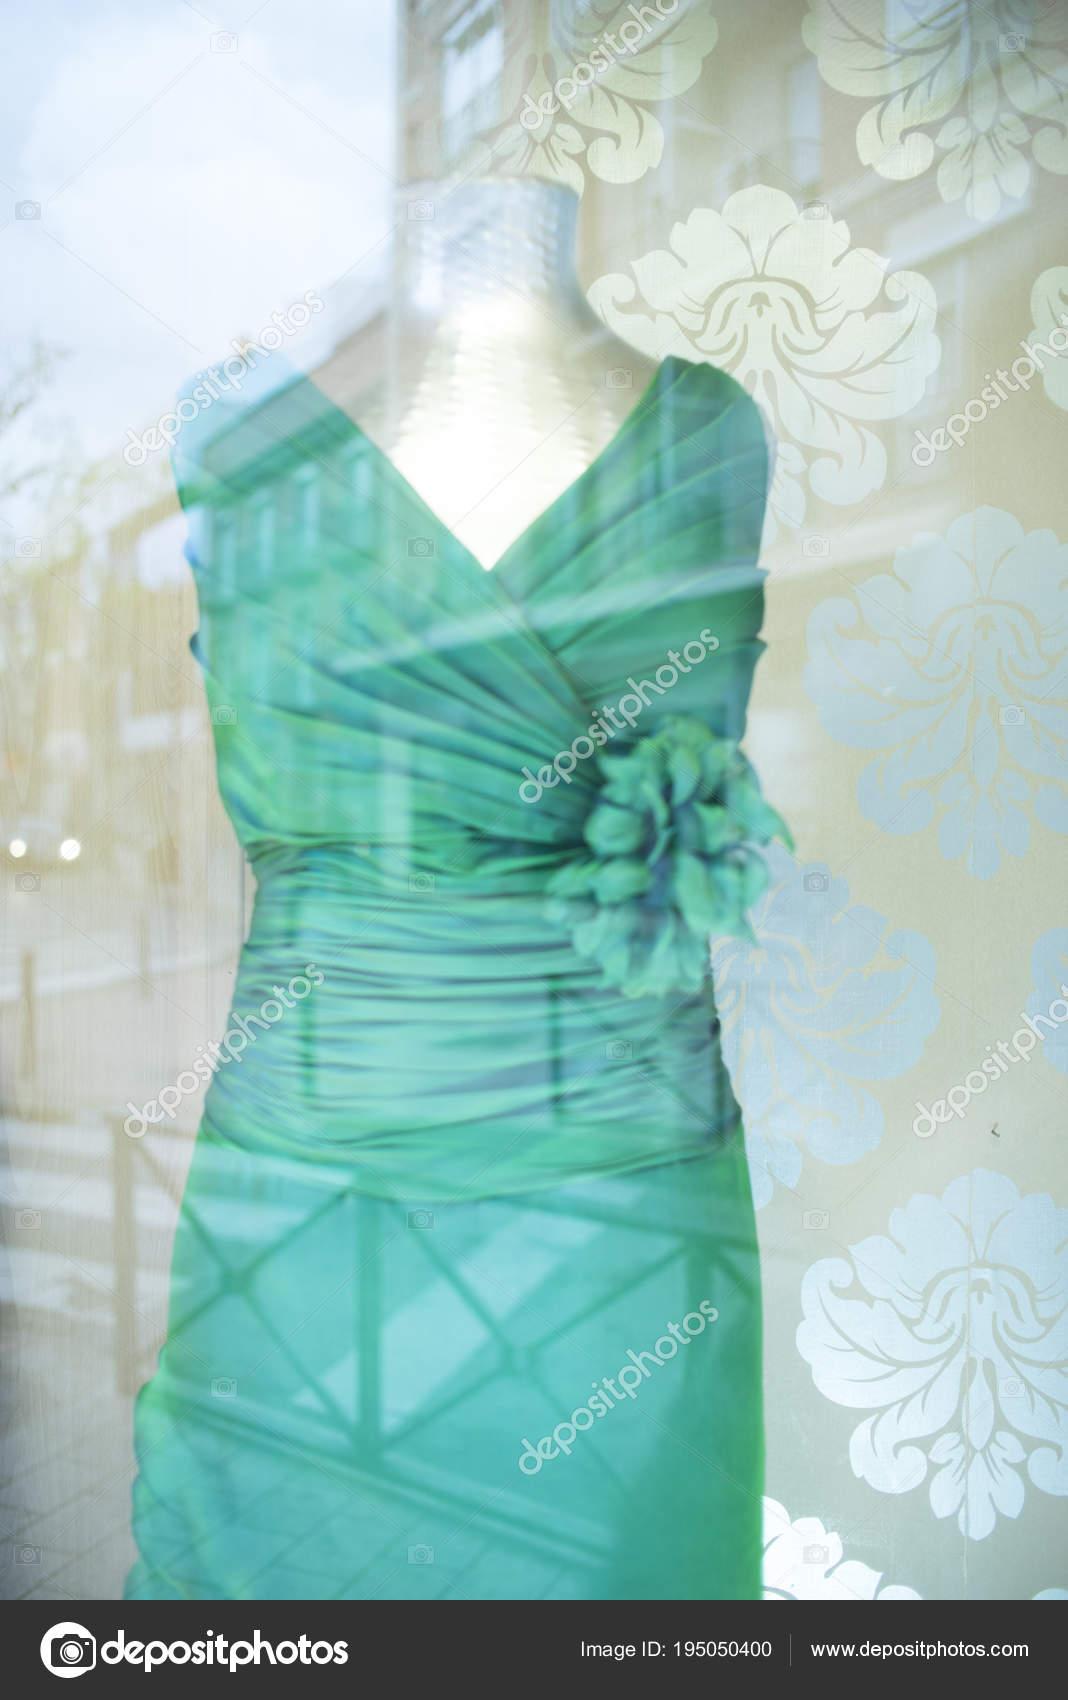 Wedding party dress shop — Stock Photo © edwardolive #195050400